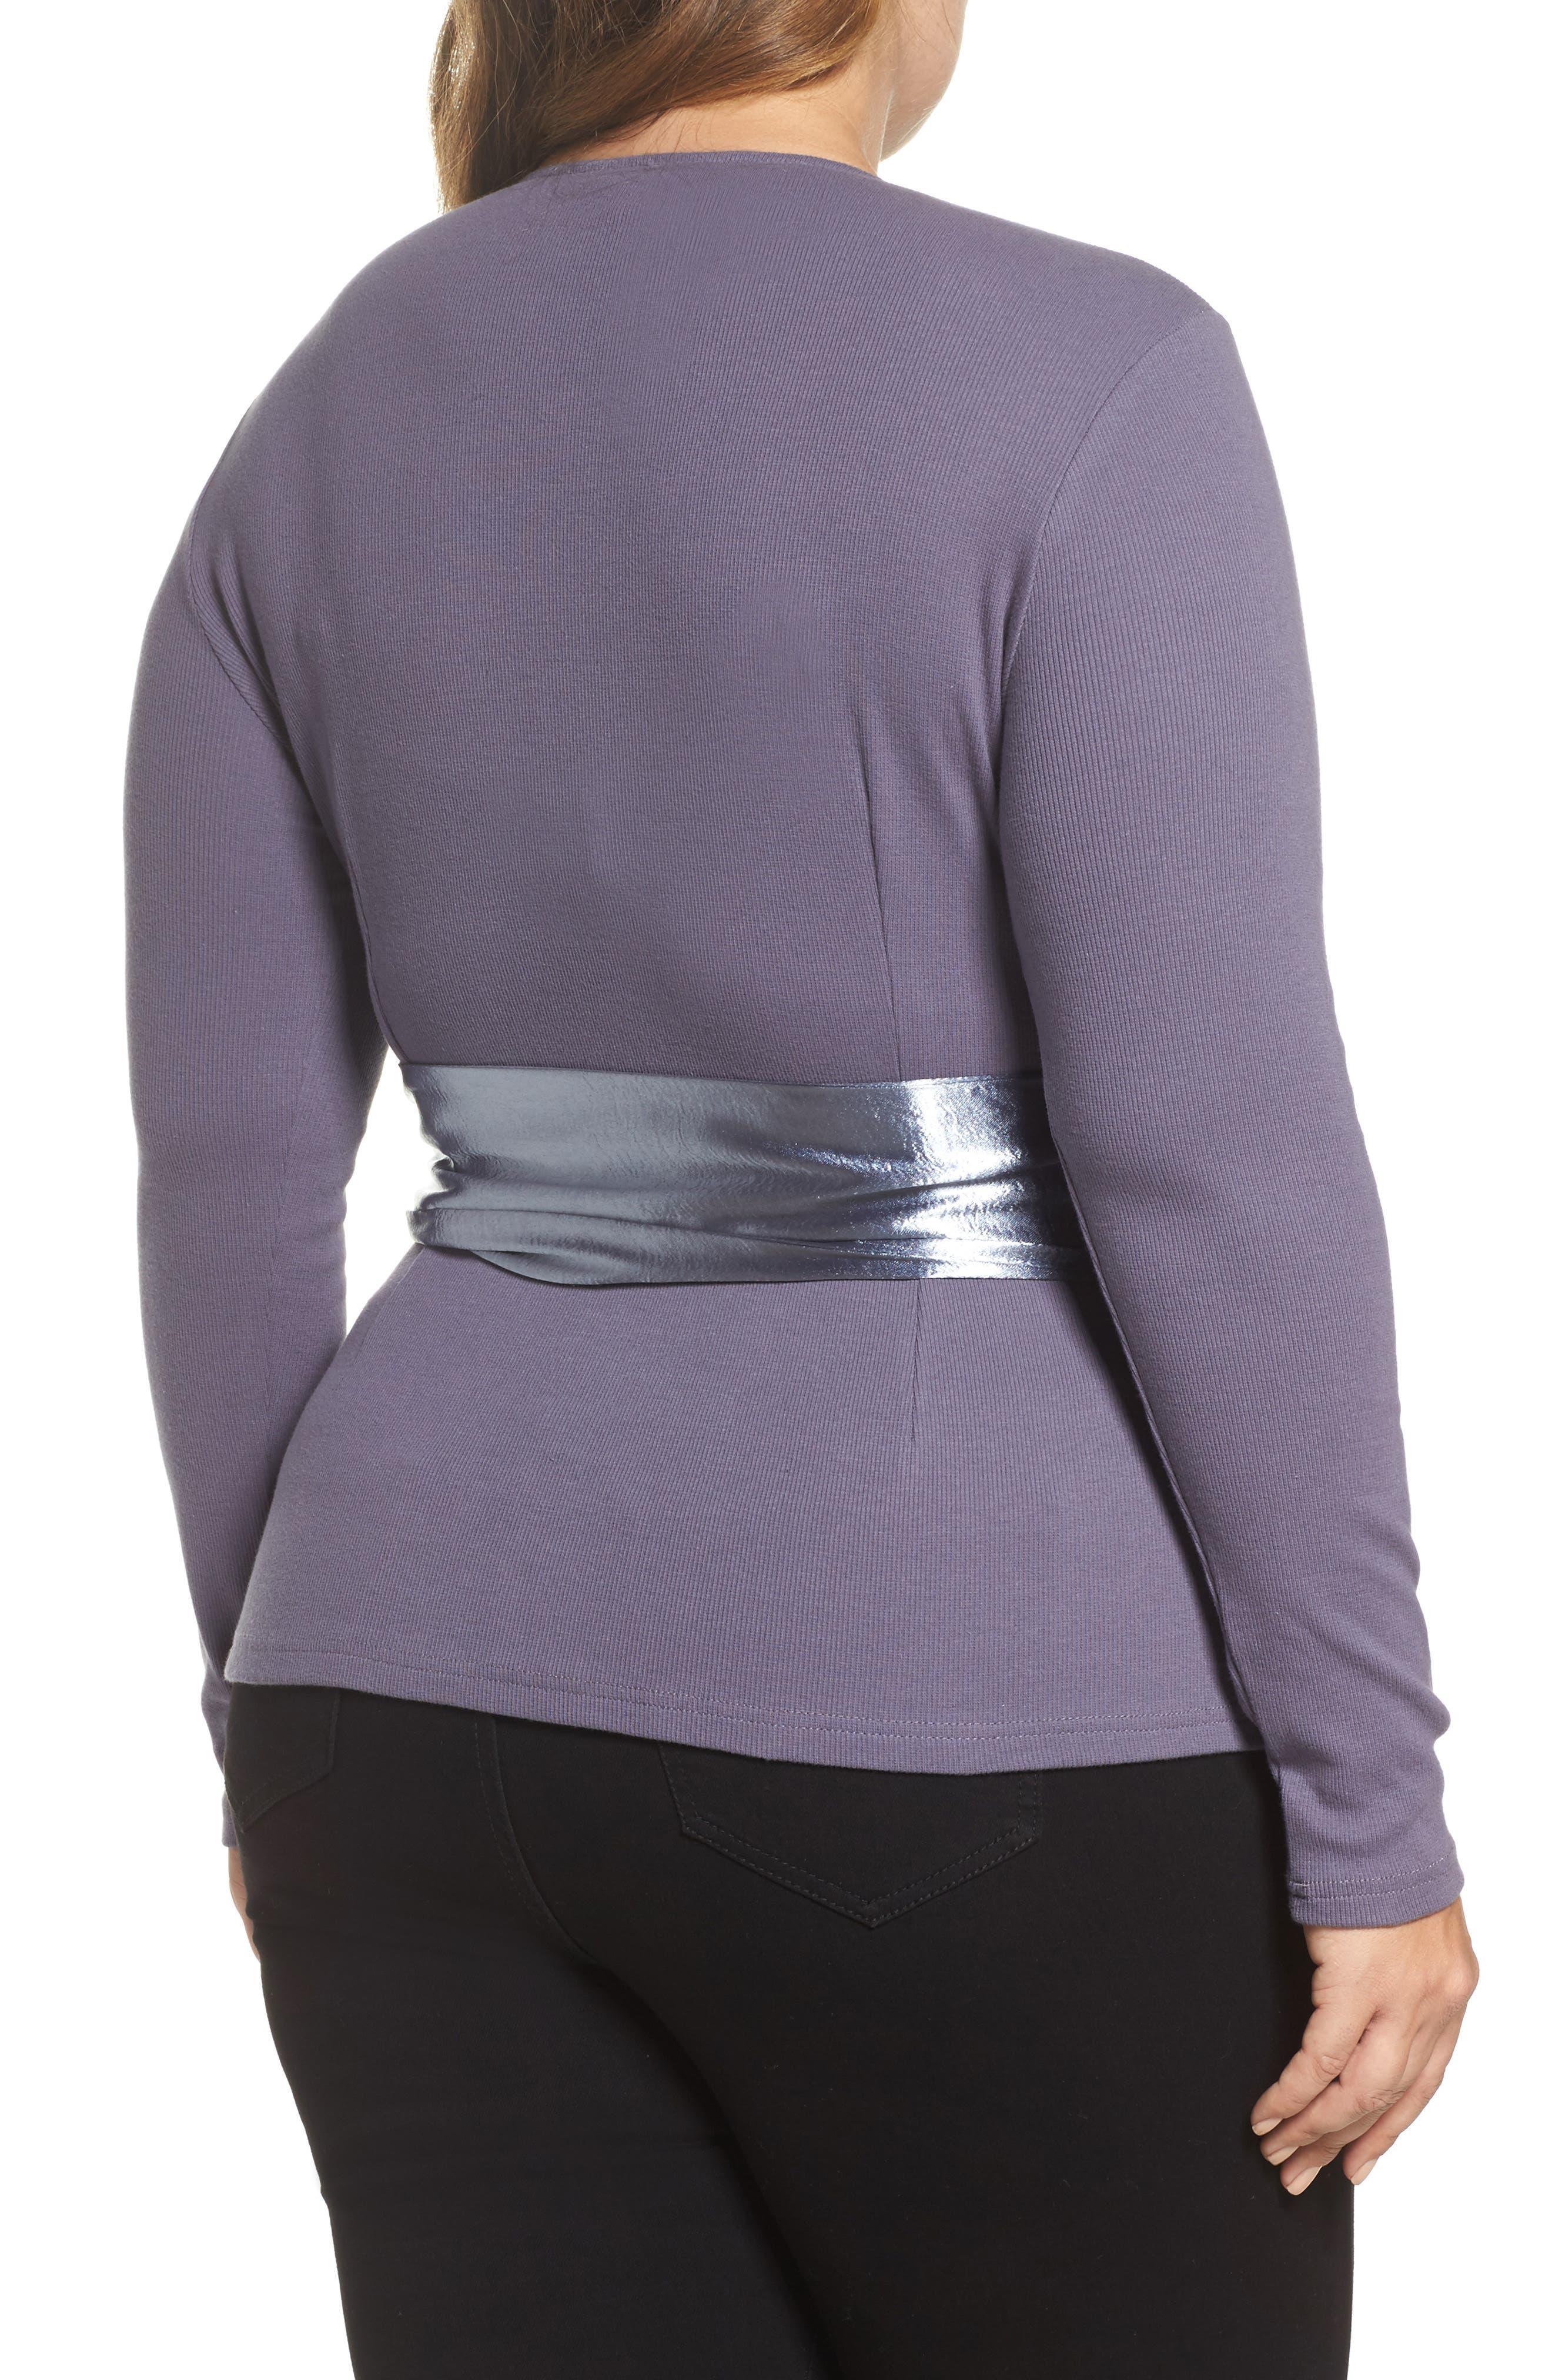 Alternate Image 2  - LOST INK Satin Sash Knit Top (Plus Size)